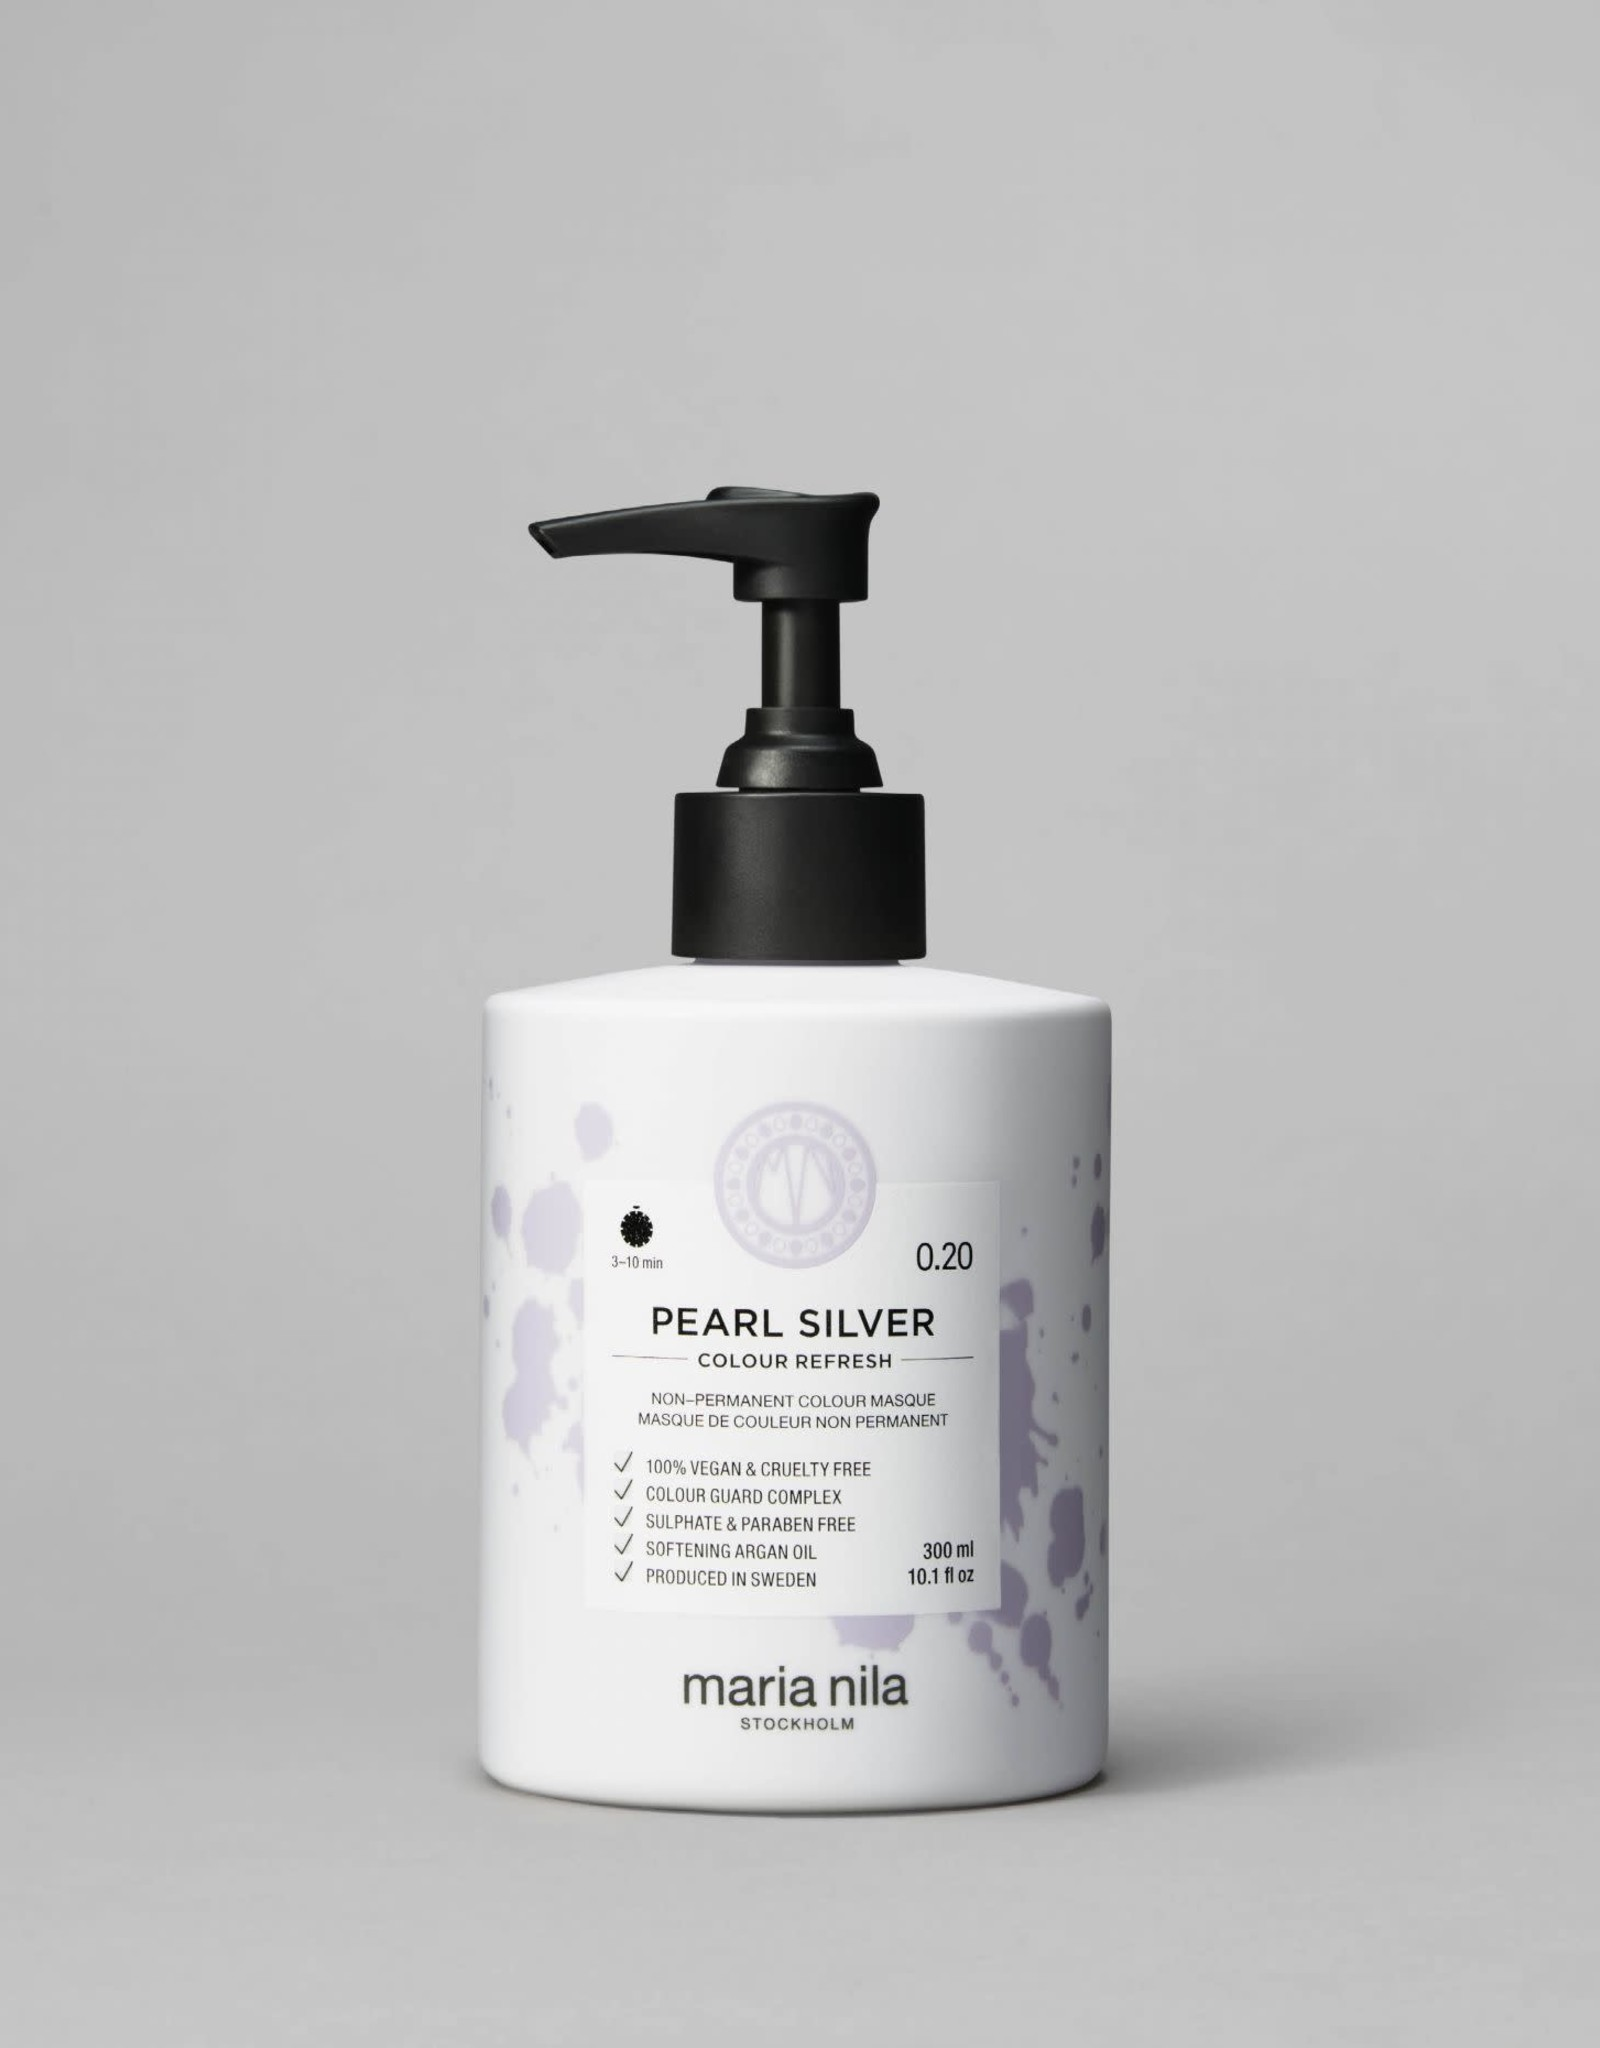 Maria Nila Colour Refresh Pearl Silver 300ml